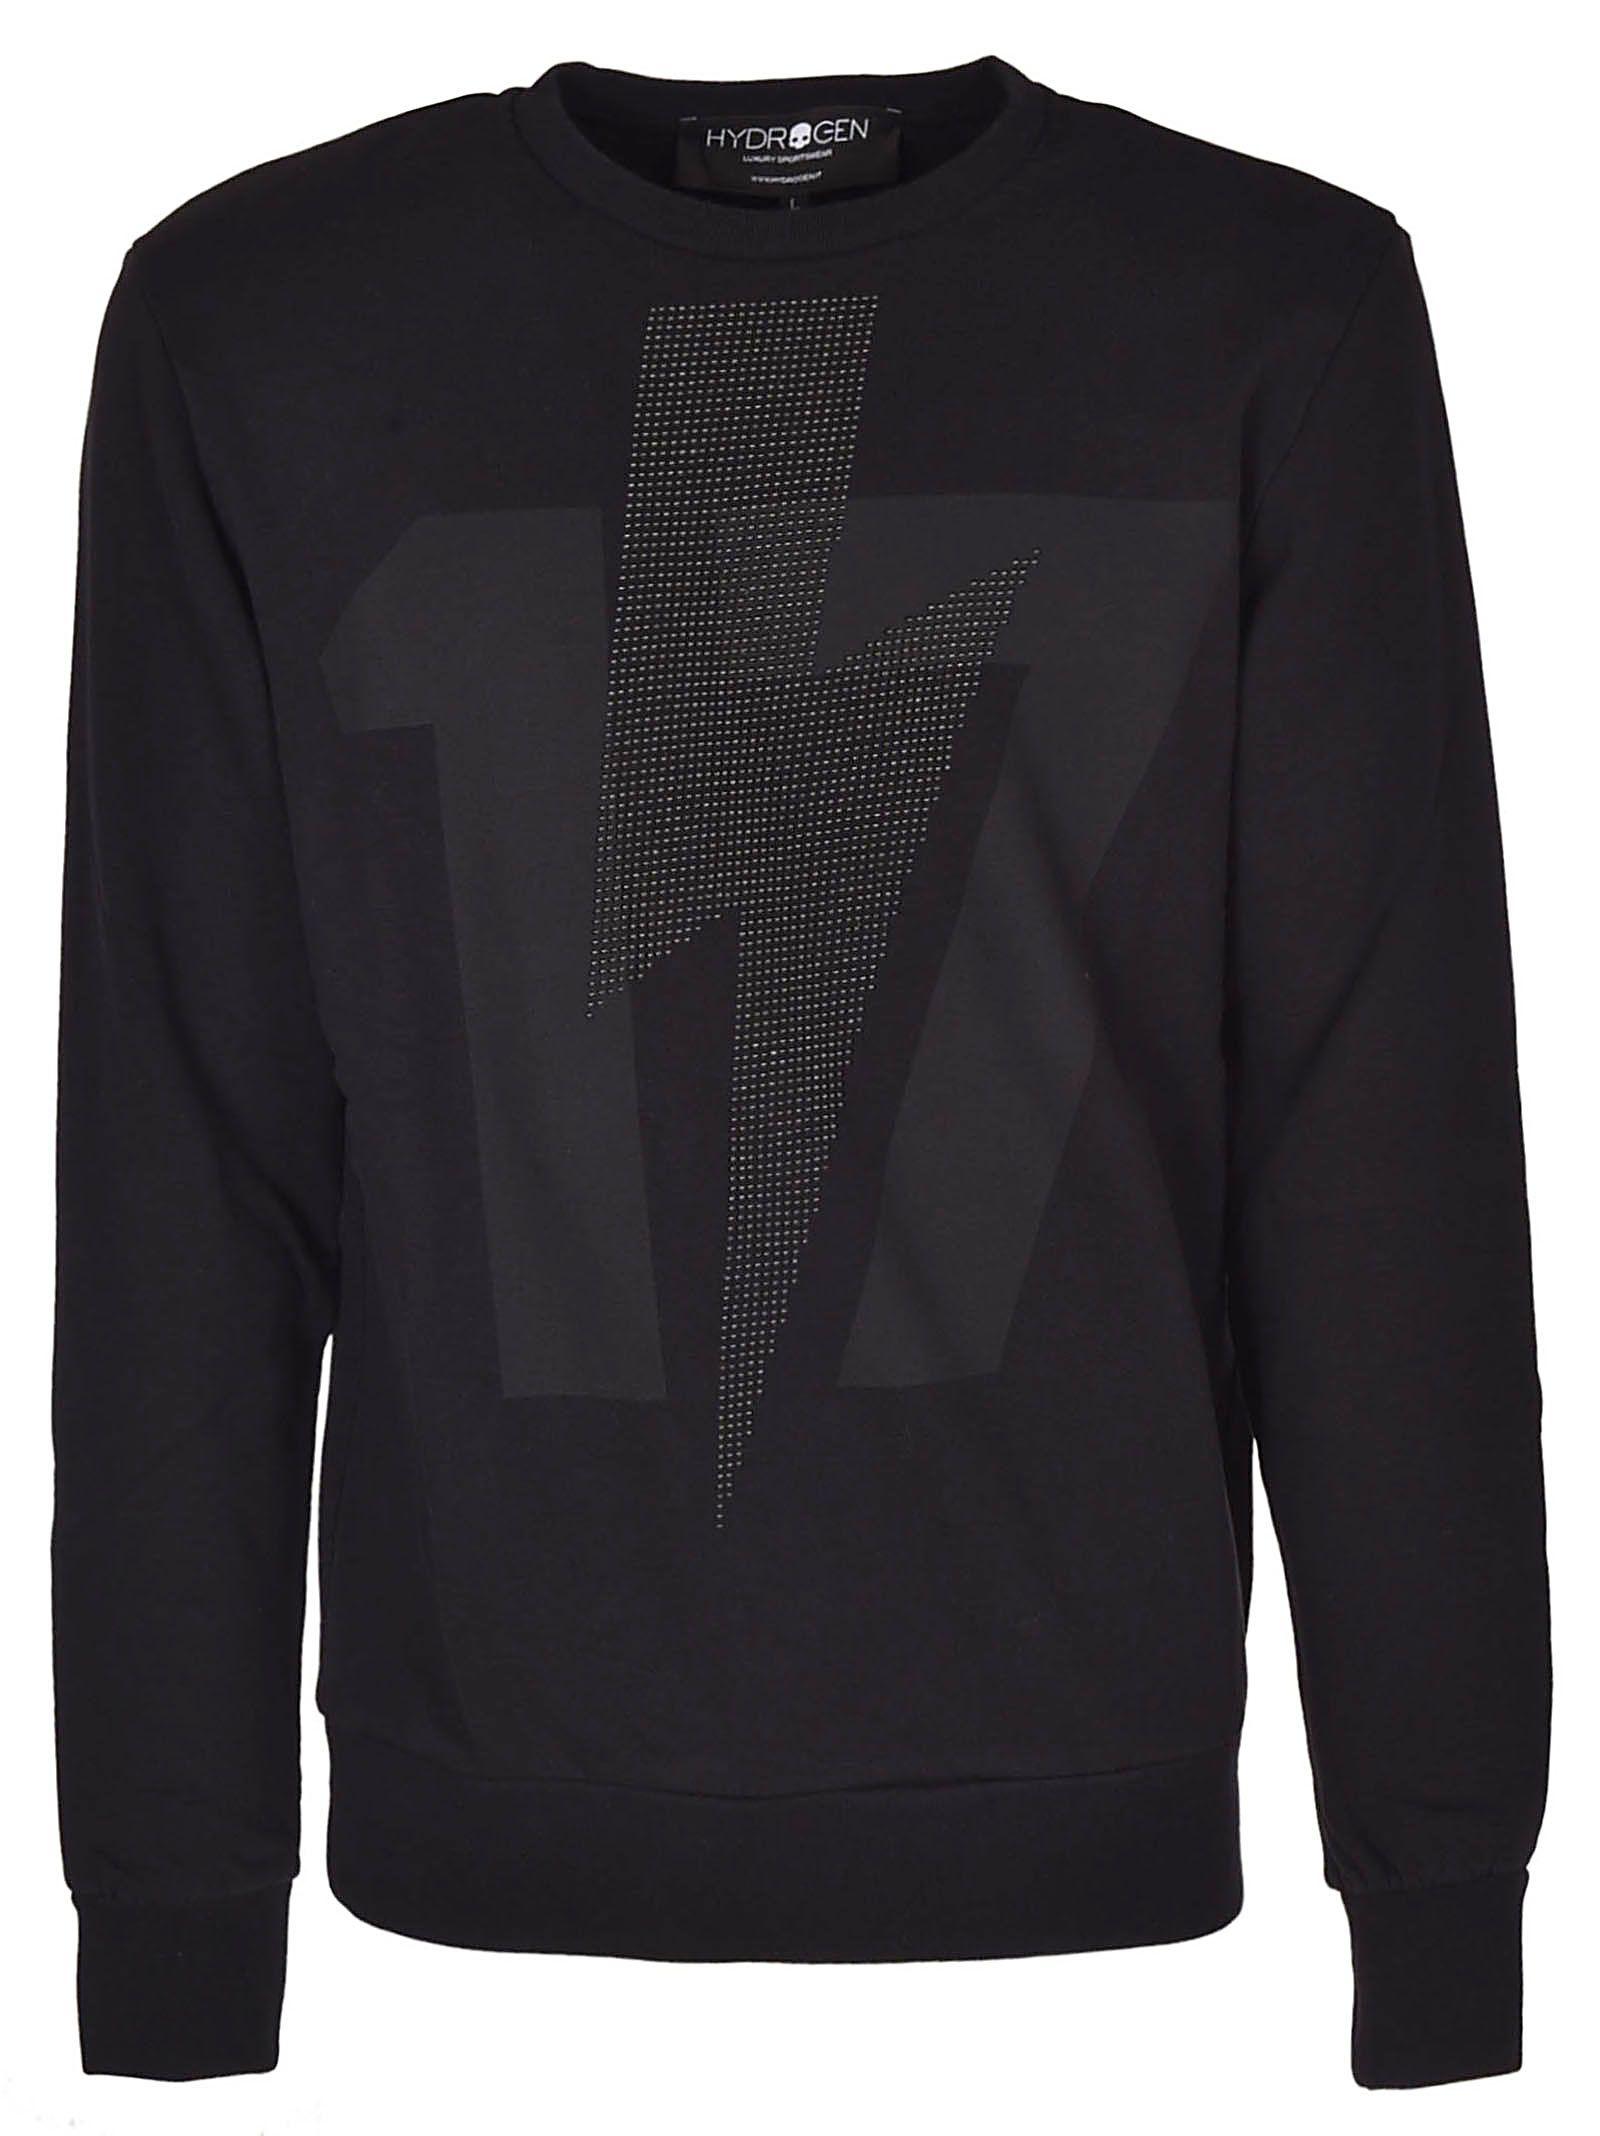 Hydrogen Thunder Studs Sweatshirt